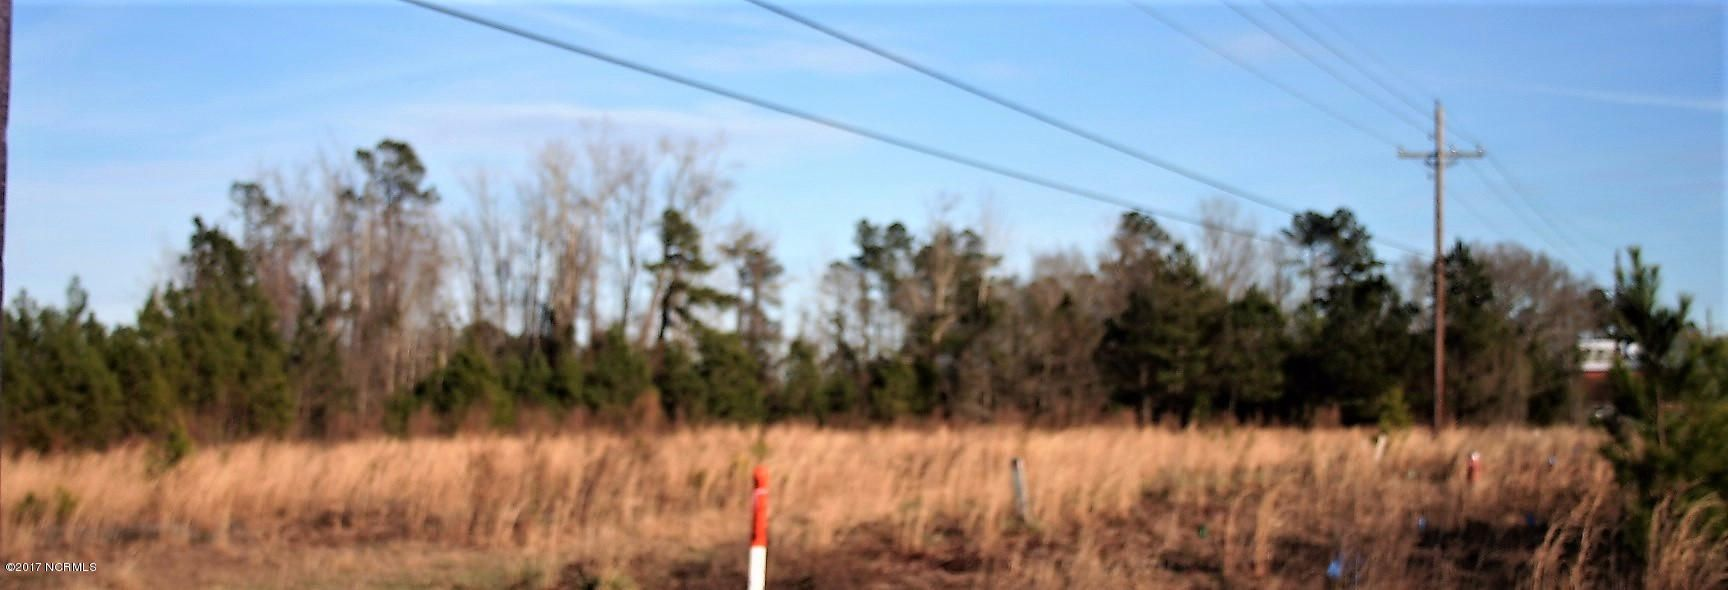 114 Andrew Jackson Highway Leland, NC 28451